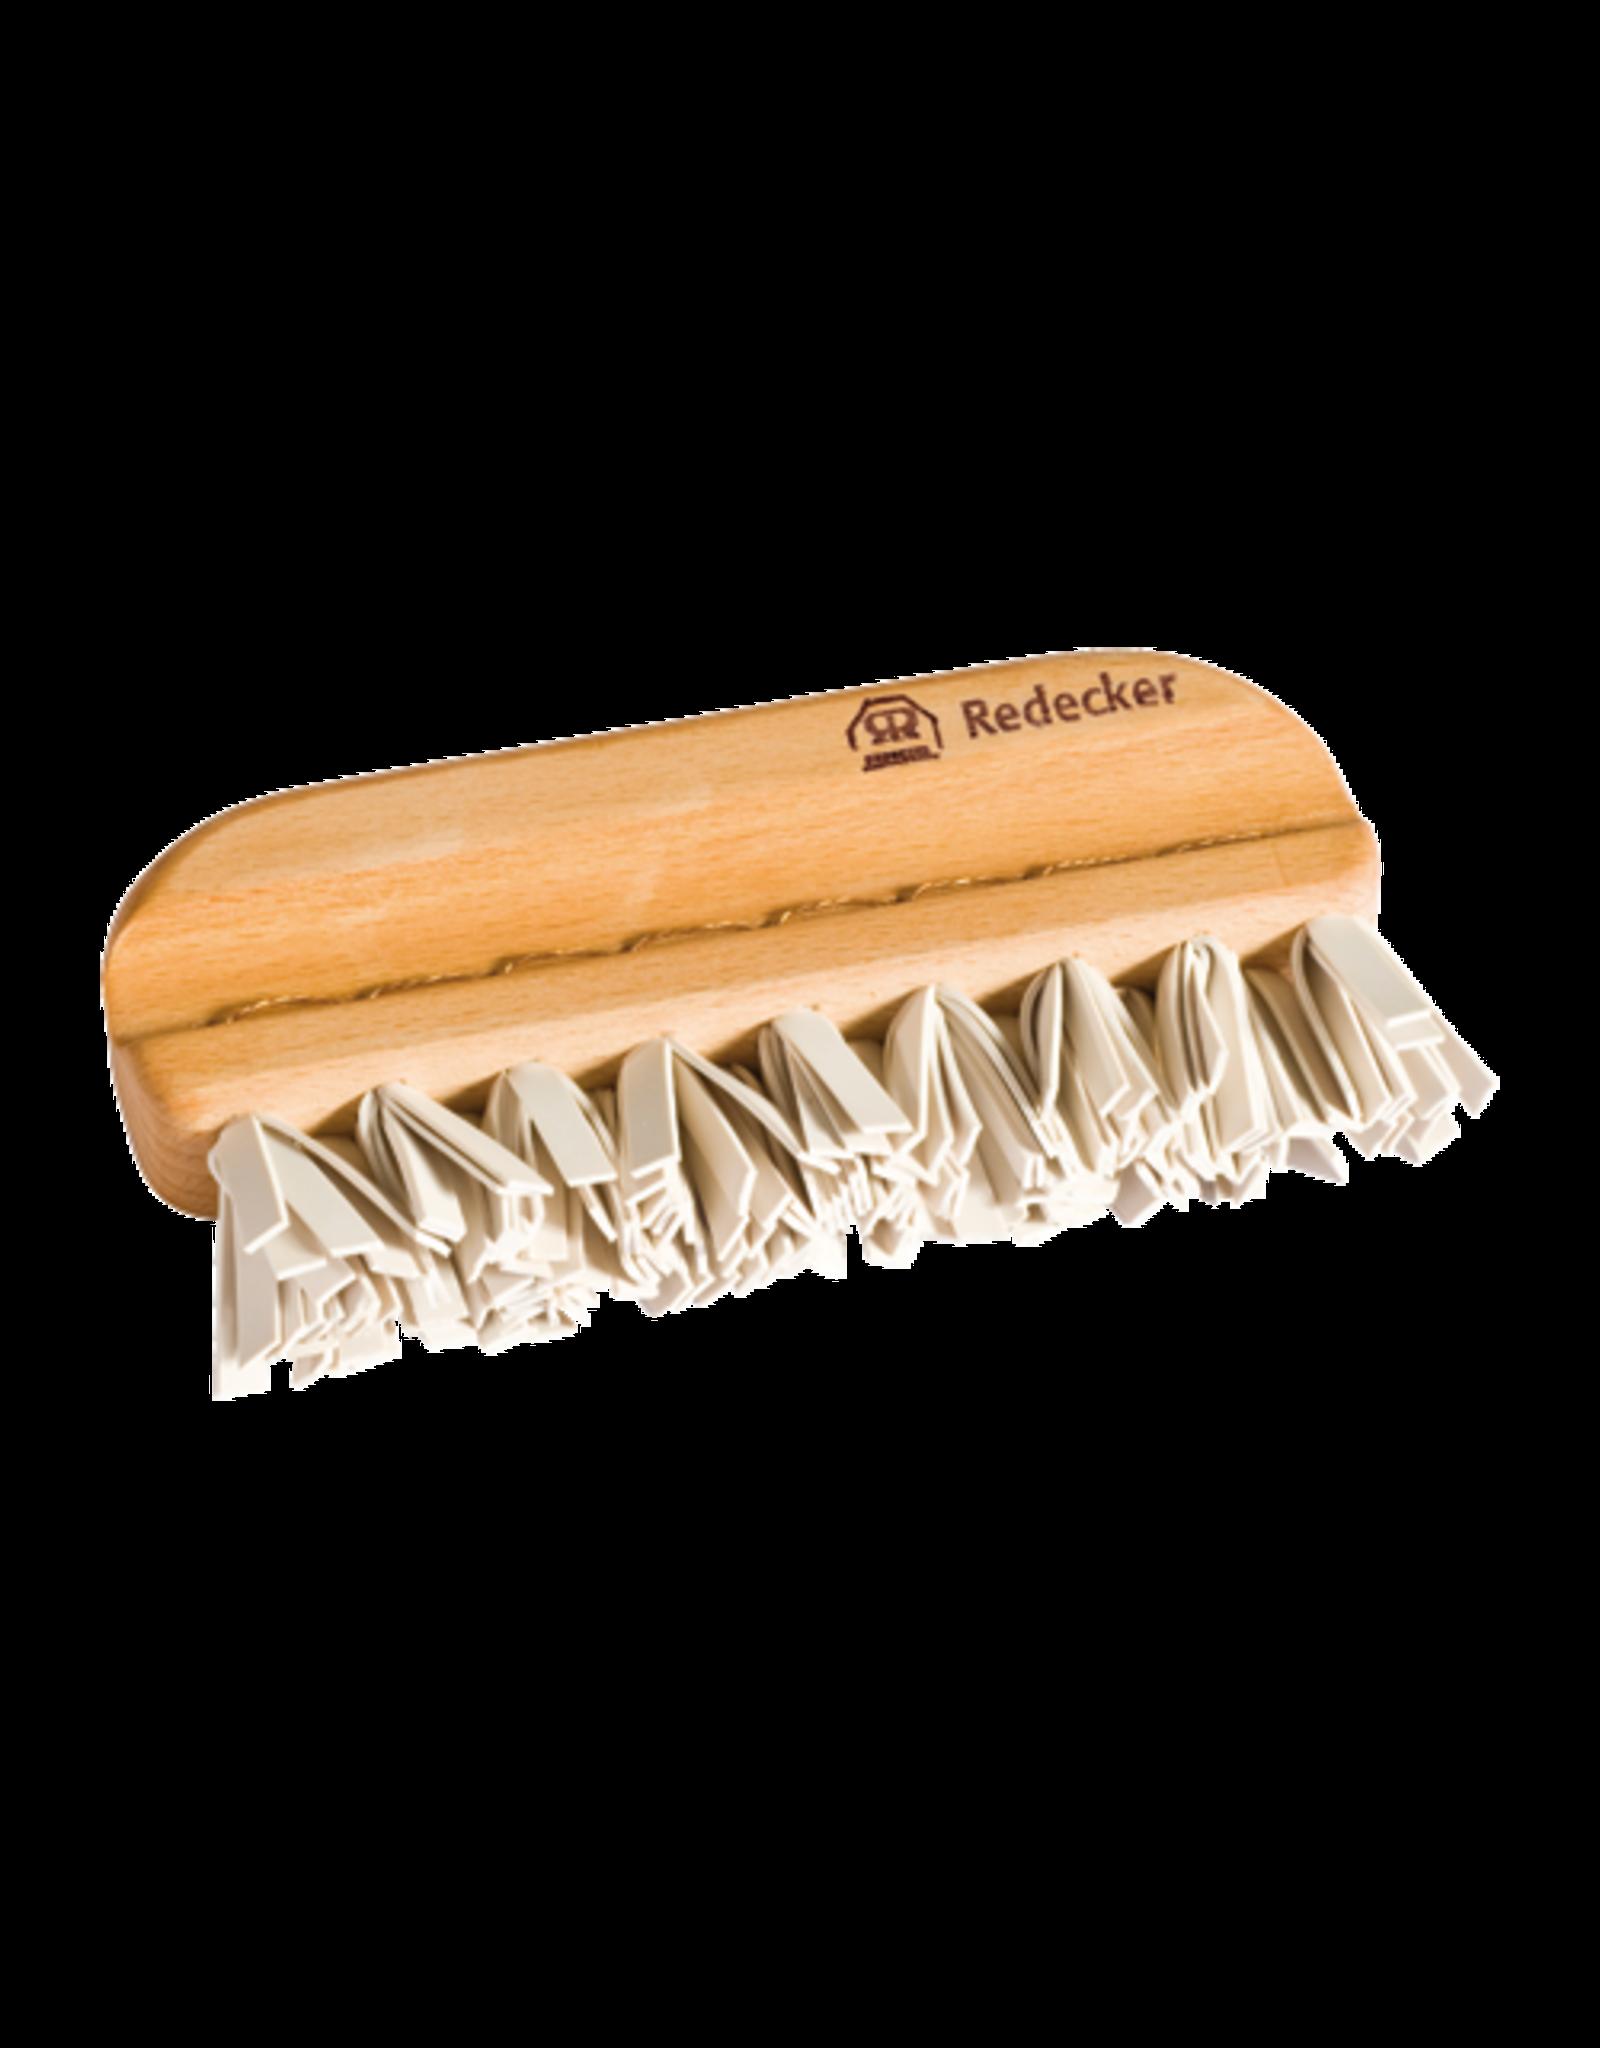 Redecker Lint Brush